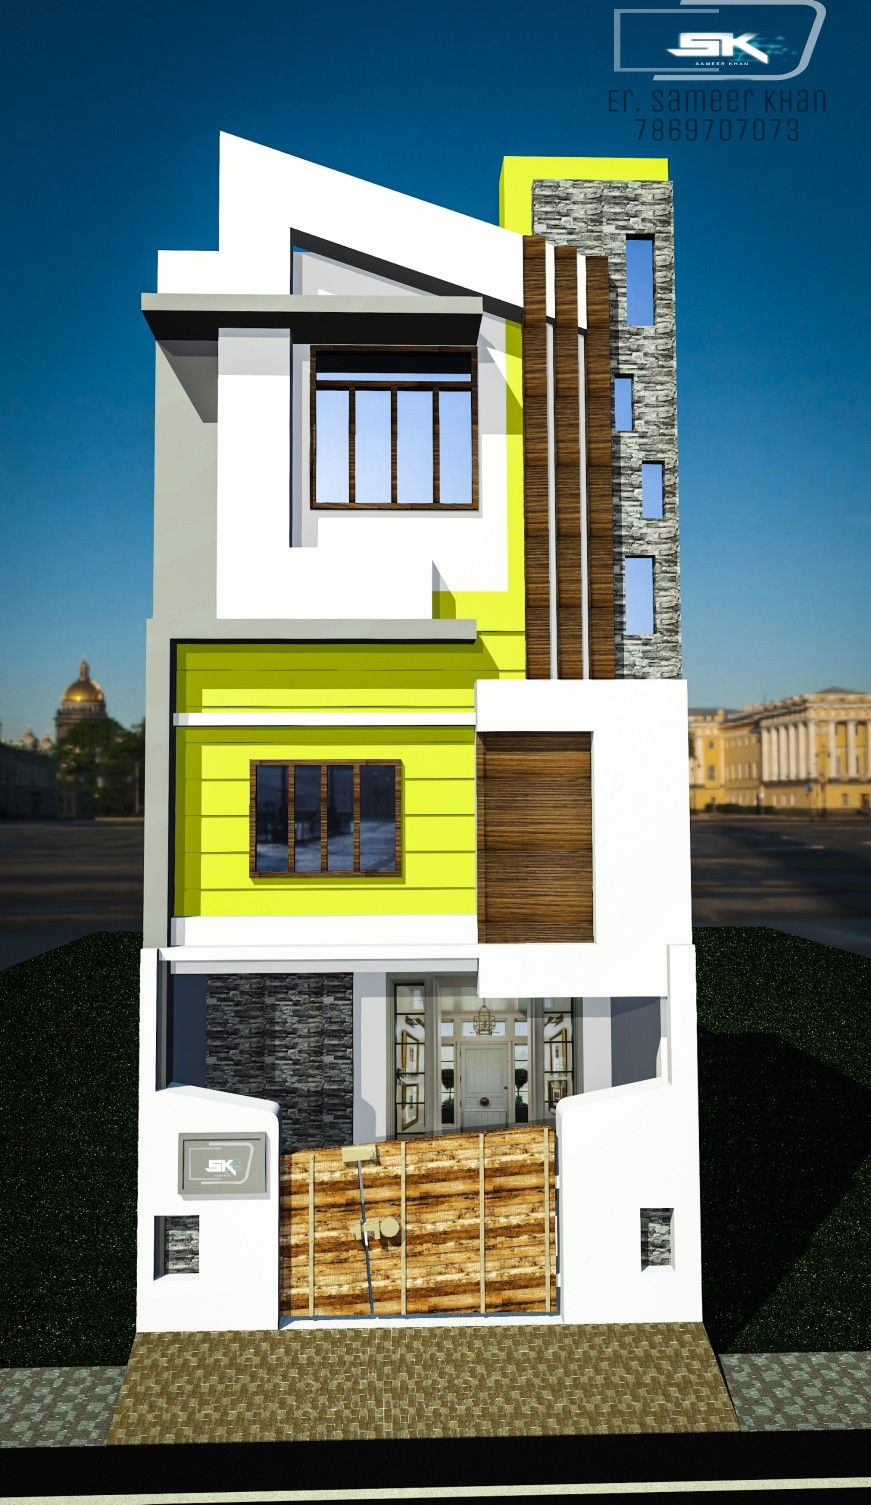 Introducing indian modern house exterior elevation by er sameer khan unique home designer   also pin karthik reya on designkk in pinterest rh